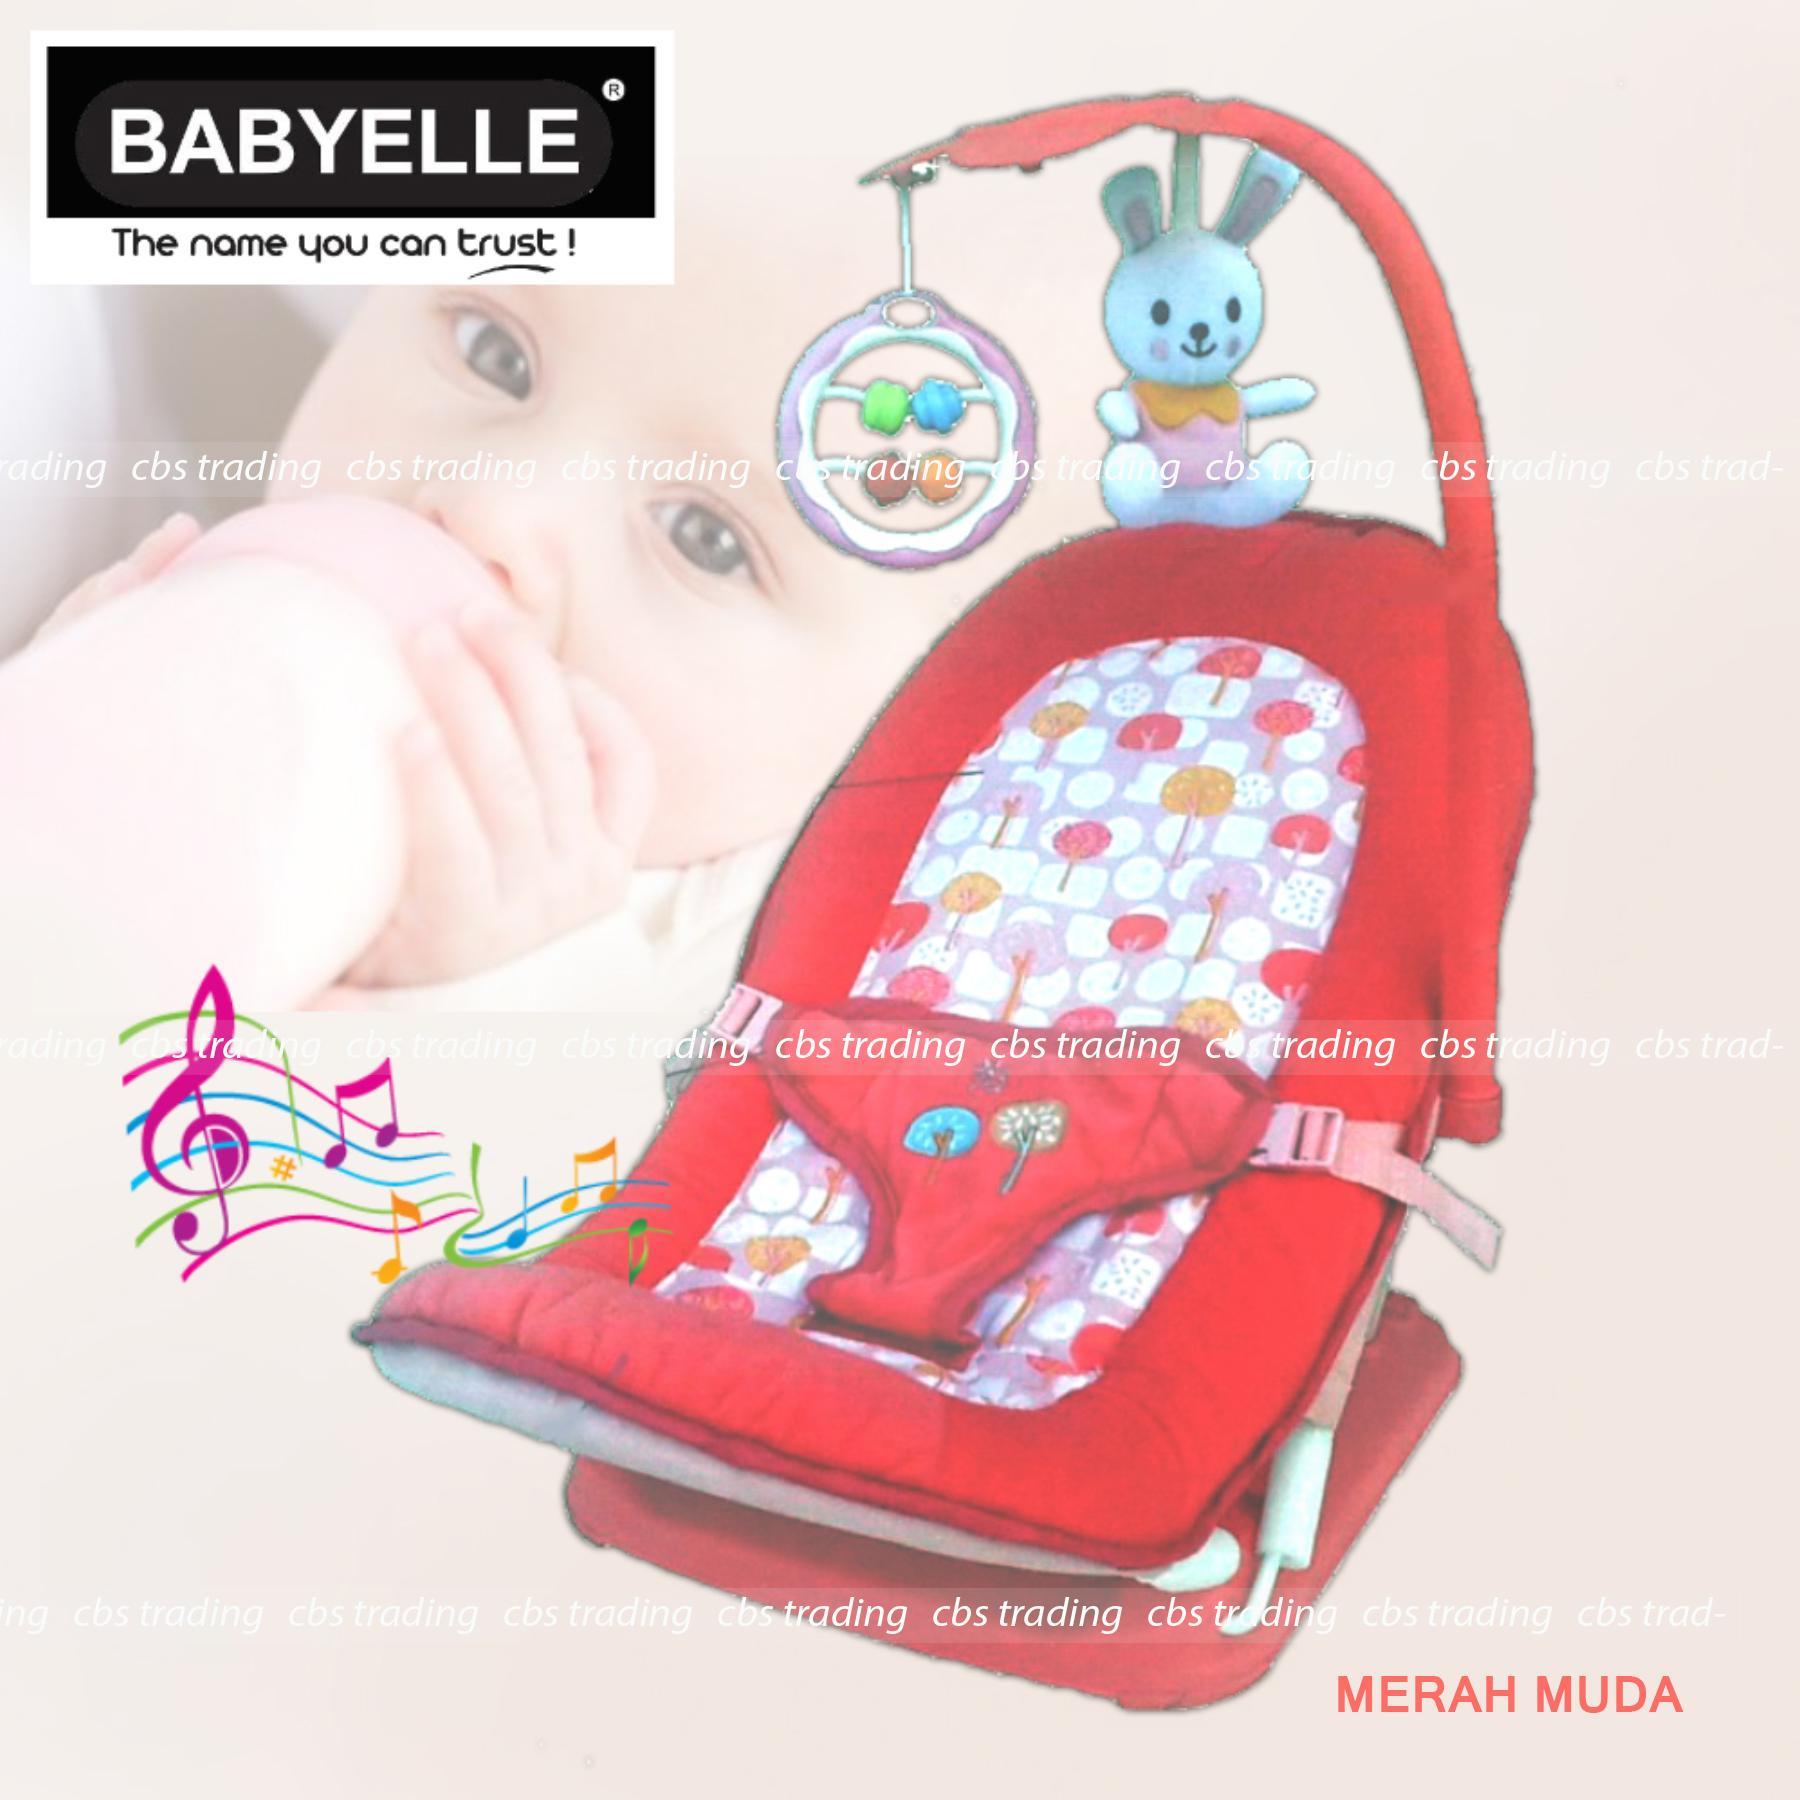 Babyelle Fold Up Infant Seat (No Box) With Melodies And Soothing Vibrations - Baby Elle Kursi Lipat Bayi - (NBX) - Merah Muda